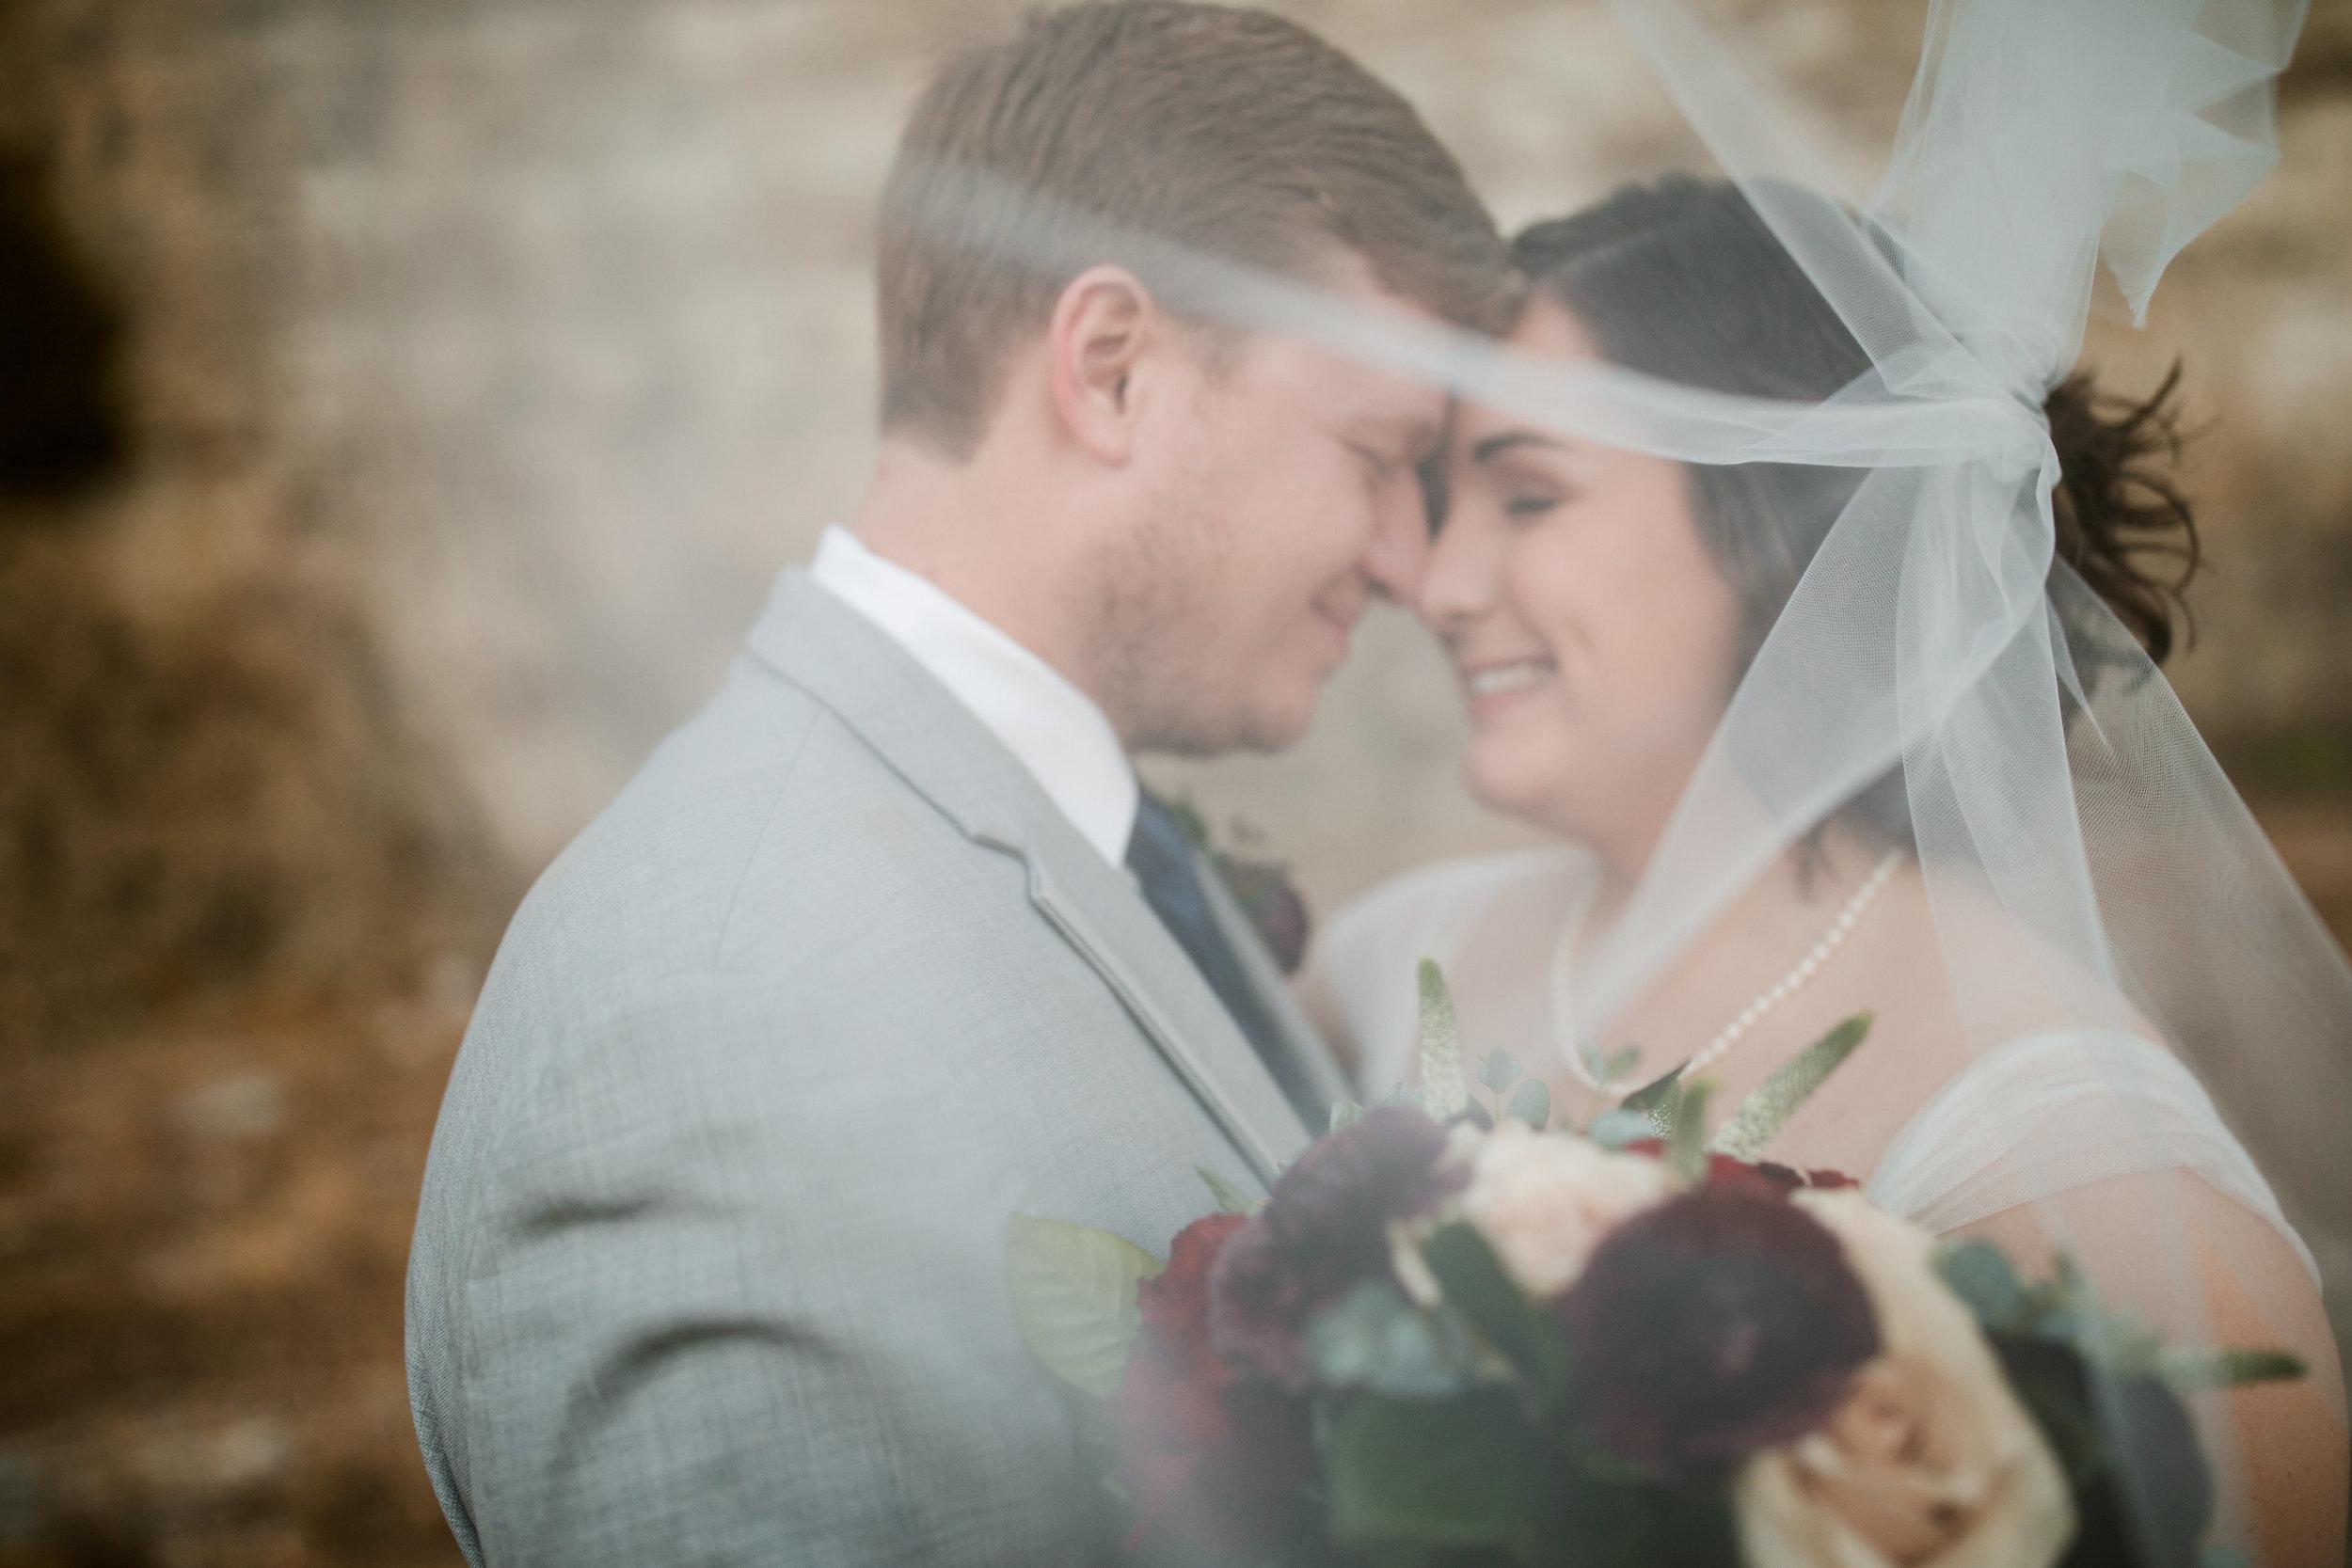 Graystone-Quarry-Wedding 66.jpg